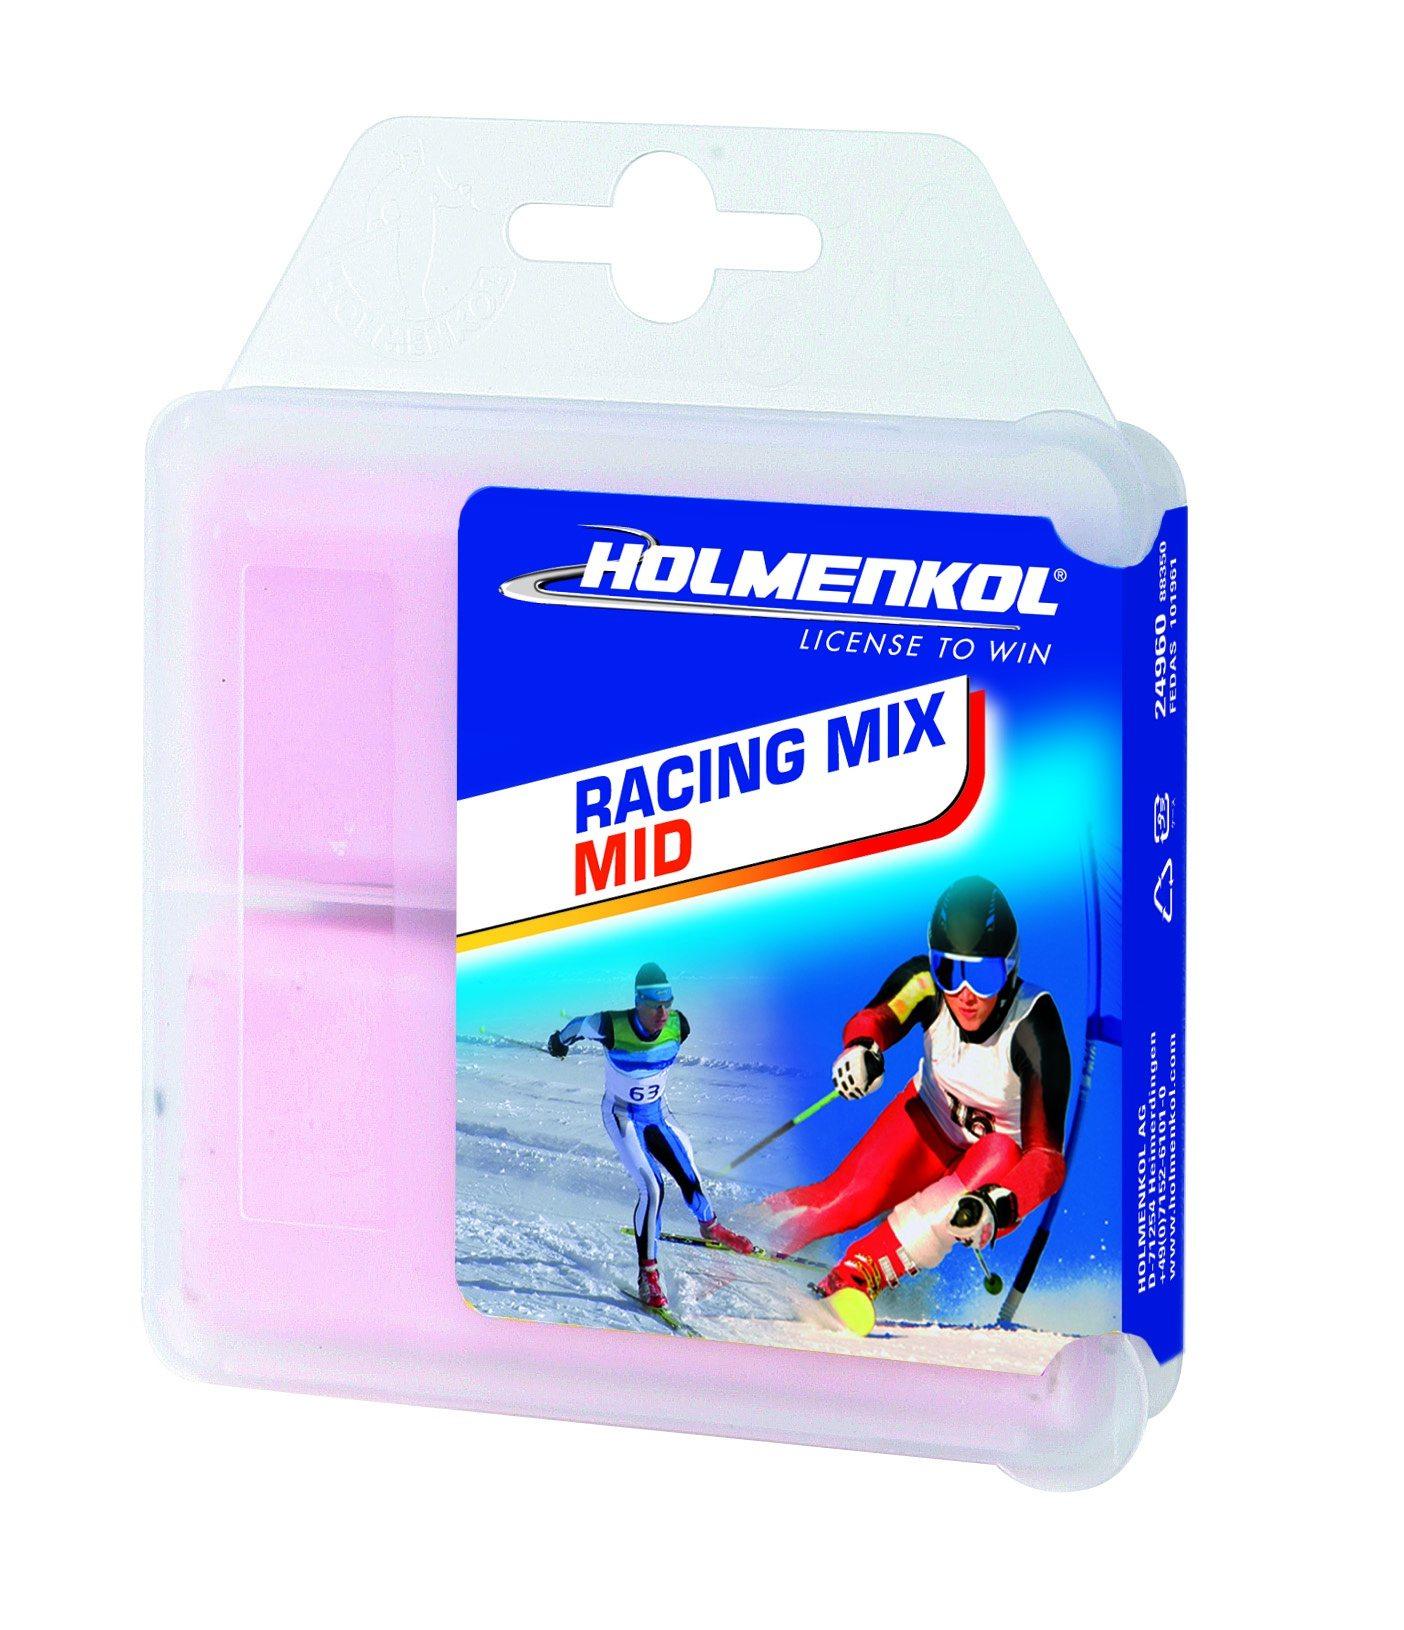 Holmenkol RacingMix Mid fluorvoks -4 - -10 C